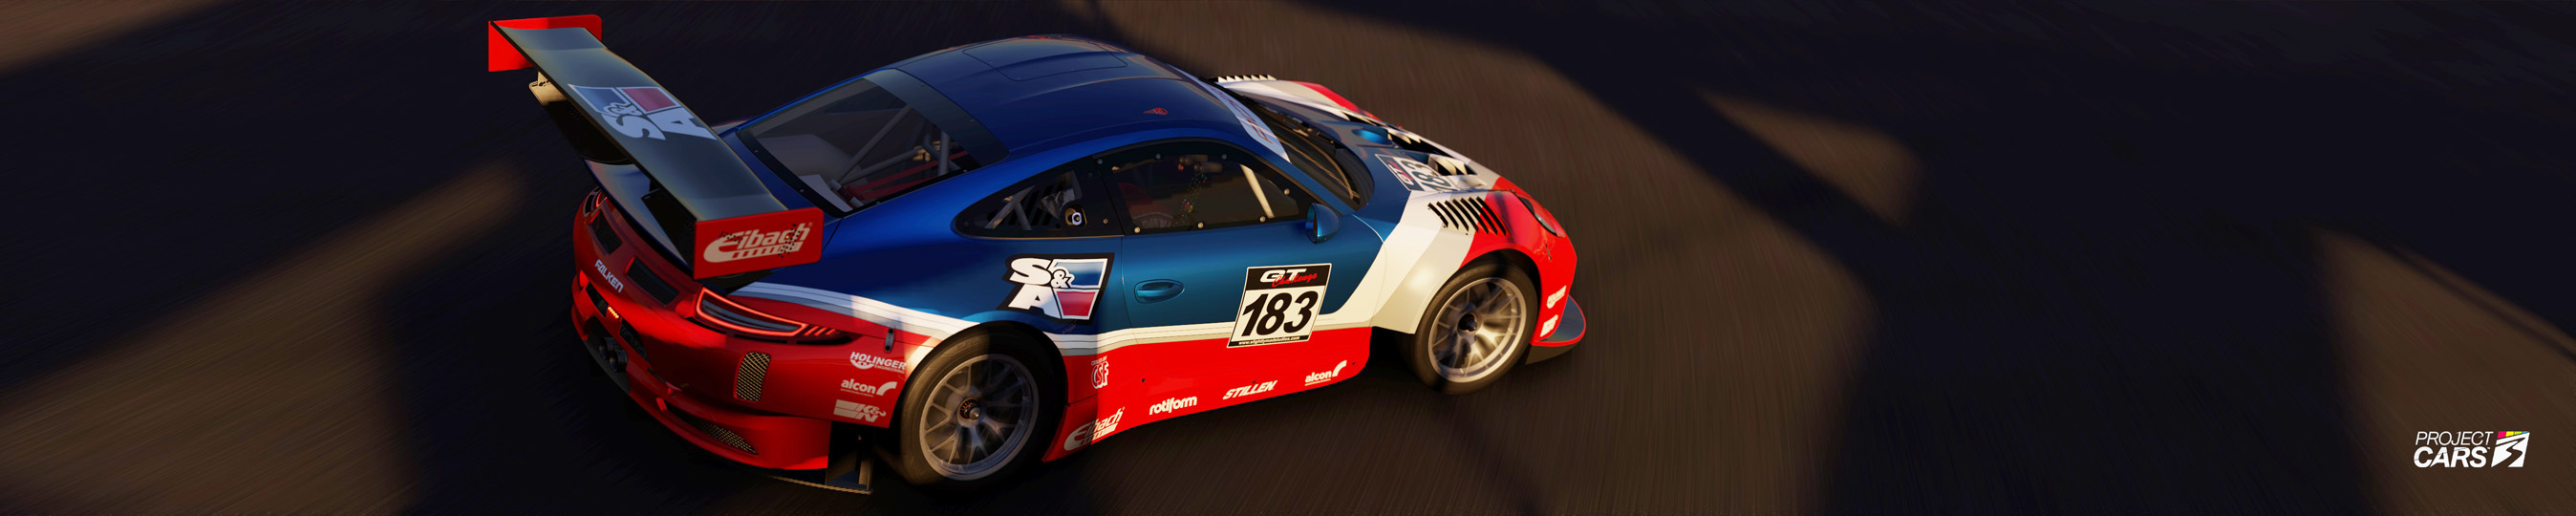 1 PROJECT CARS 3 PORSCHE 911 GT3 R at NURBURGRING crop copy.jpg